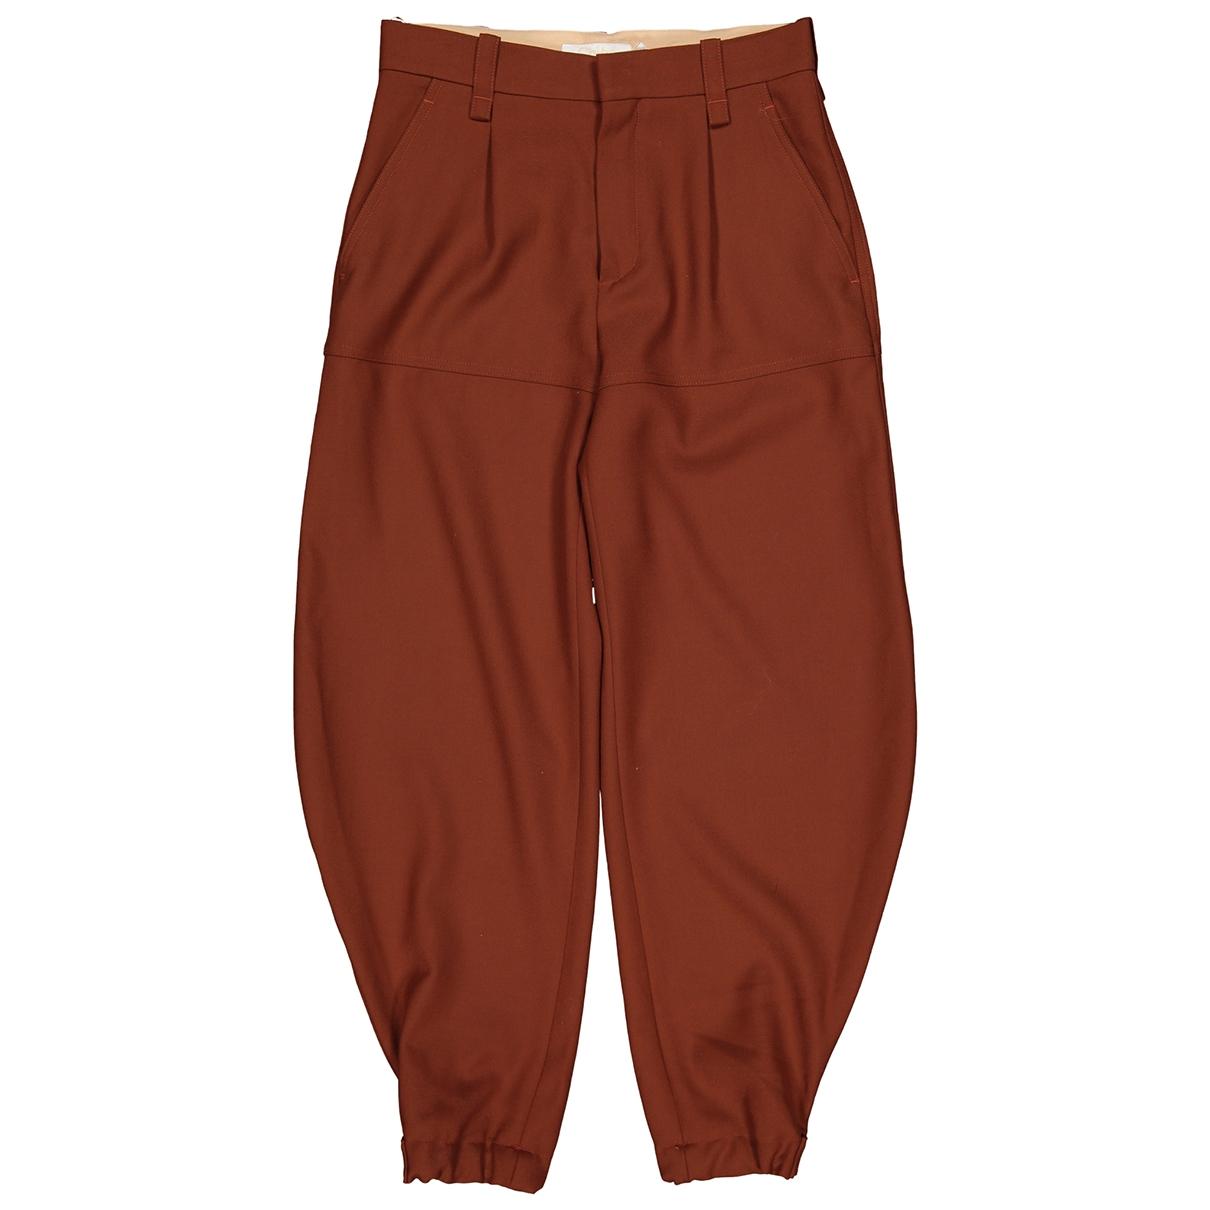 Chloé \N Brown Wool Trousers for Women 36 FR